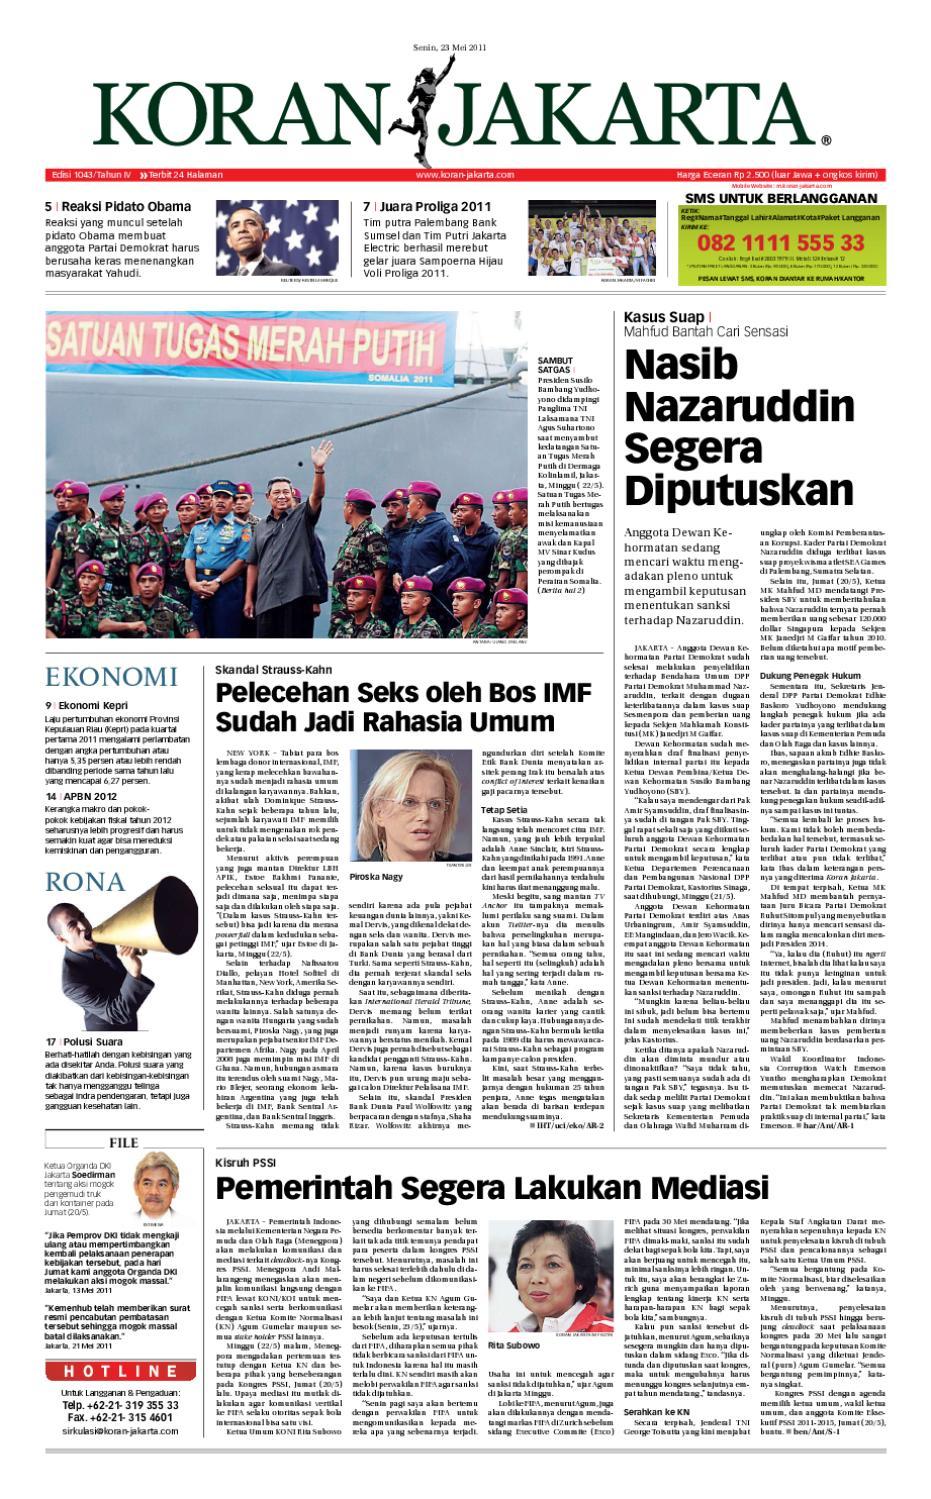 Edisi 1043 23 Mei 2011 By Pt Berita Nusantara Issuu Produk Ukm Bumn Tenun Pagatan Kemeja Pria Biru Kapal